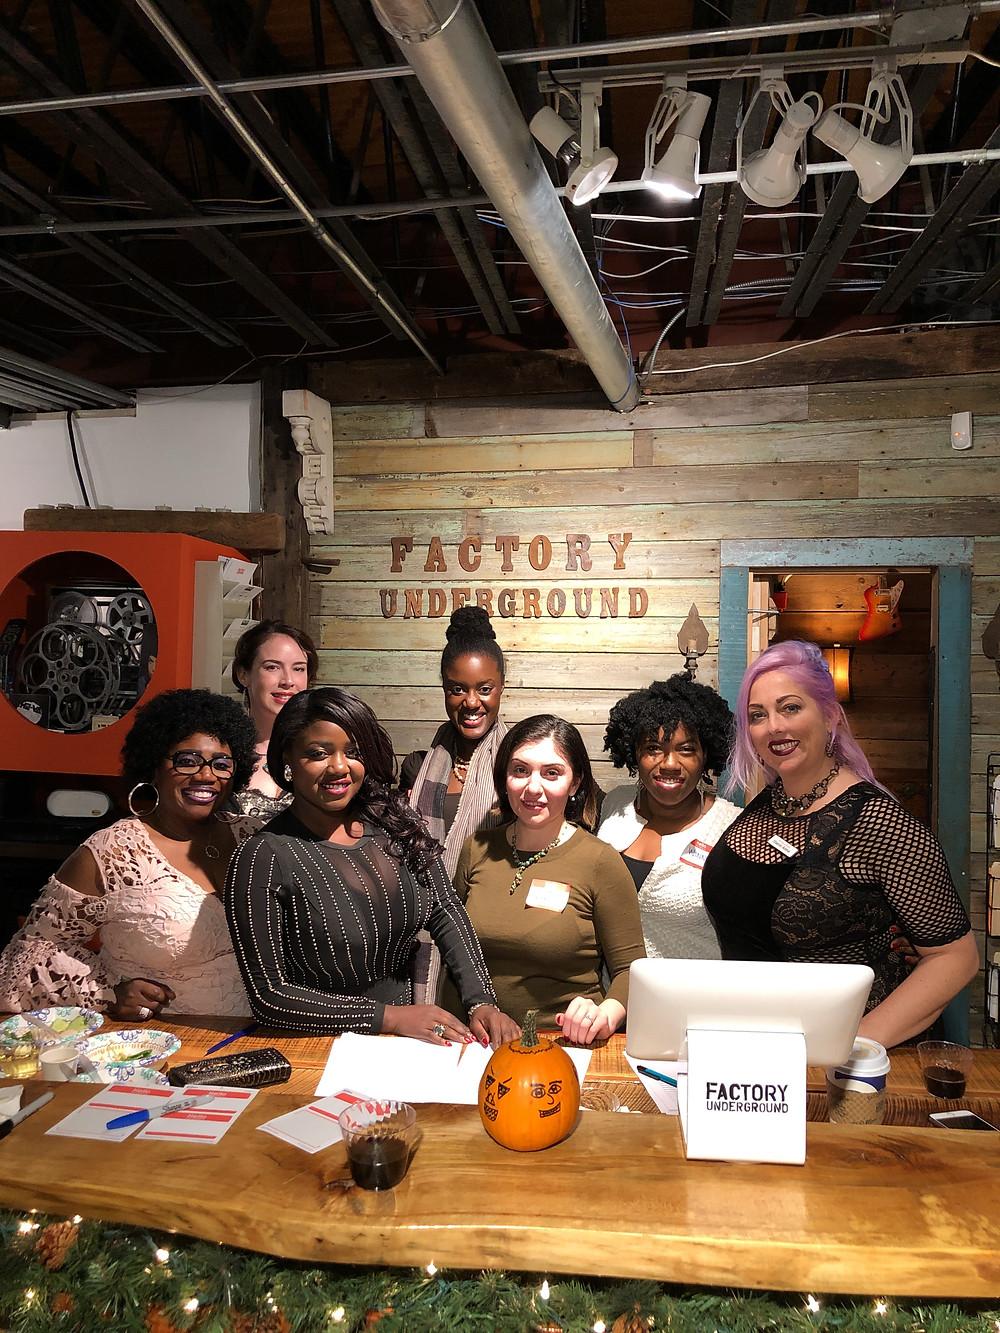 Event organizer, Katia Garcon, and friends manning the front desk at Factory Underground Studio